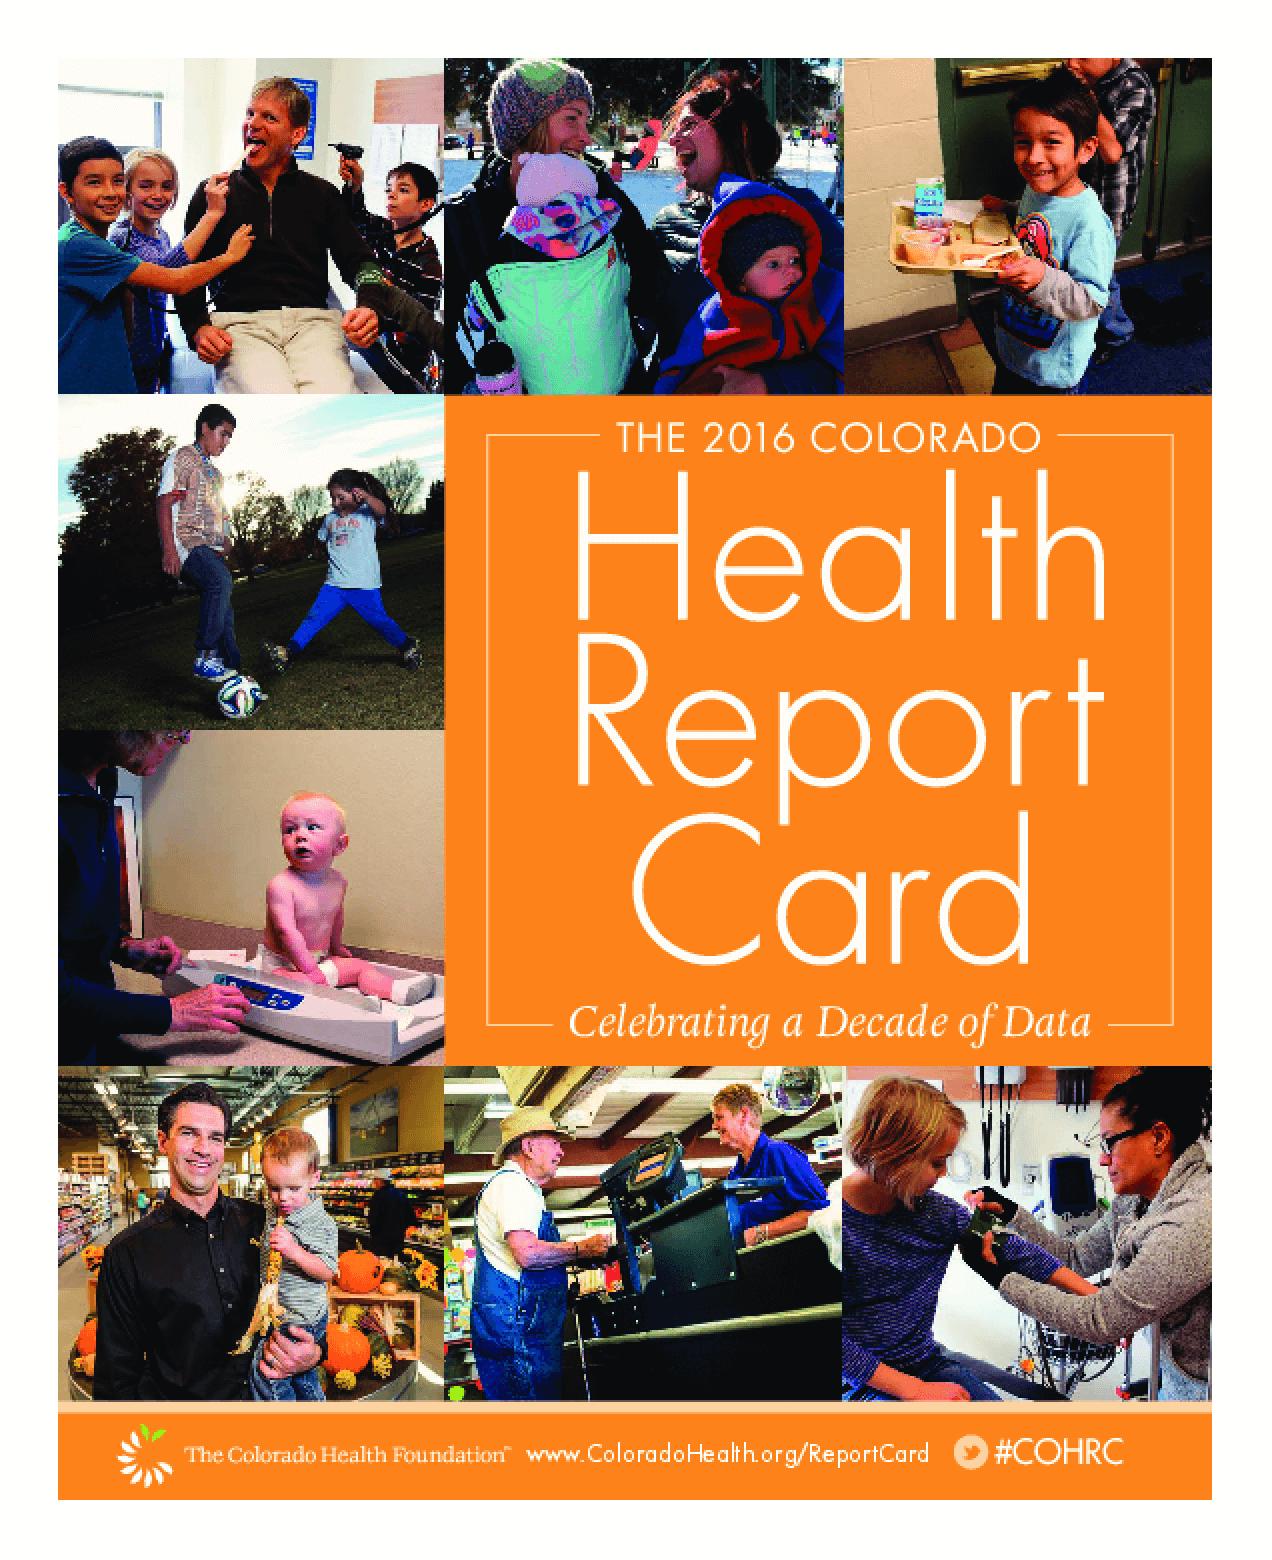 The 2016 Colorado Health Report Card: Celebrating a Decade of Data